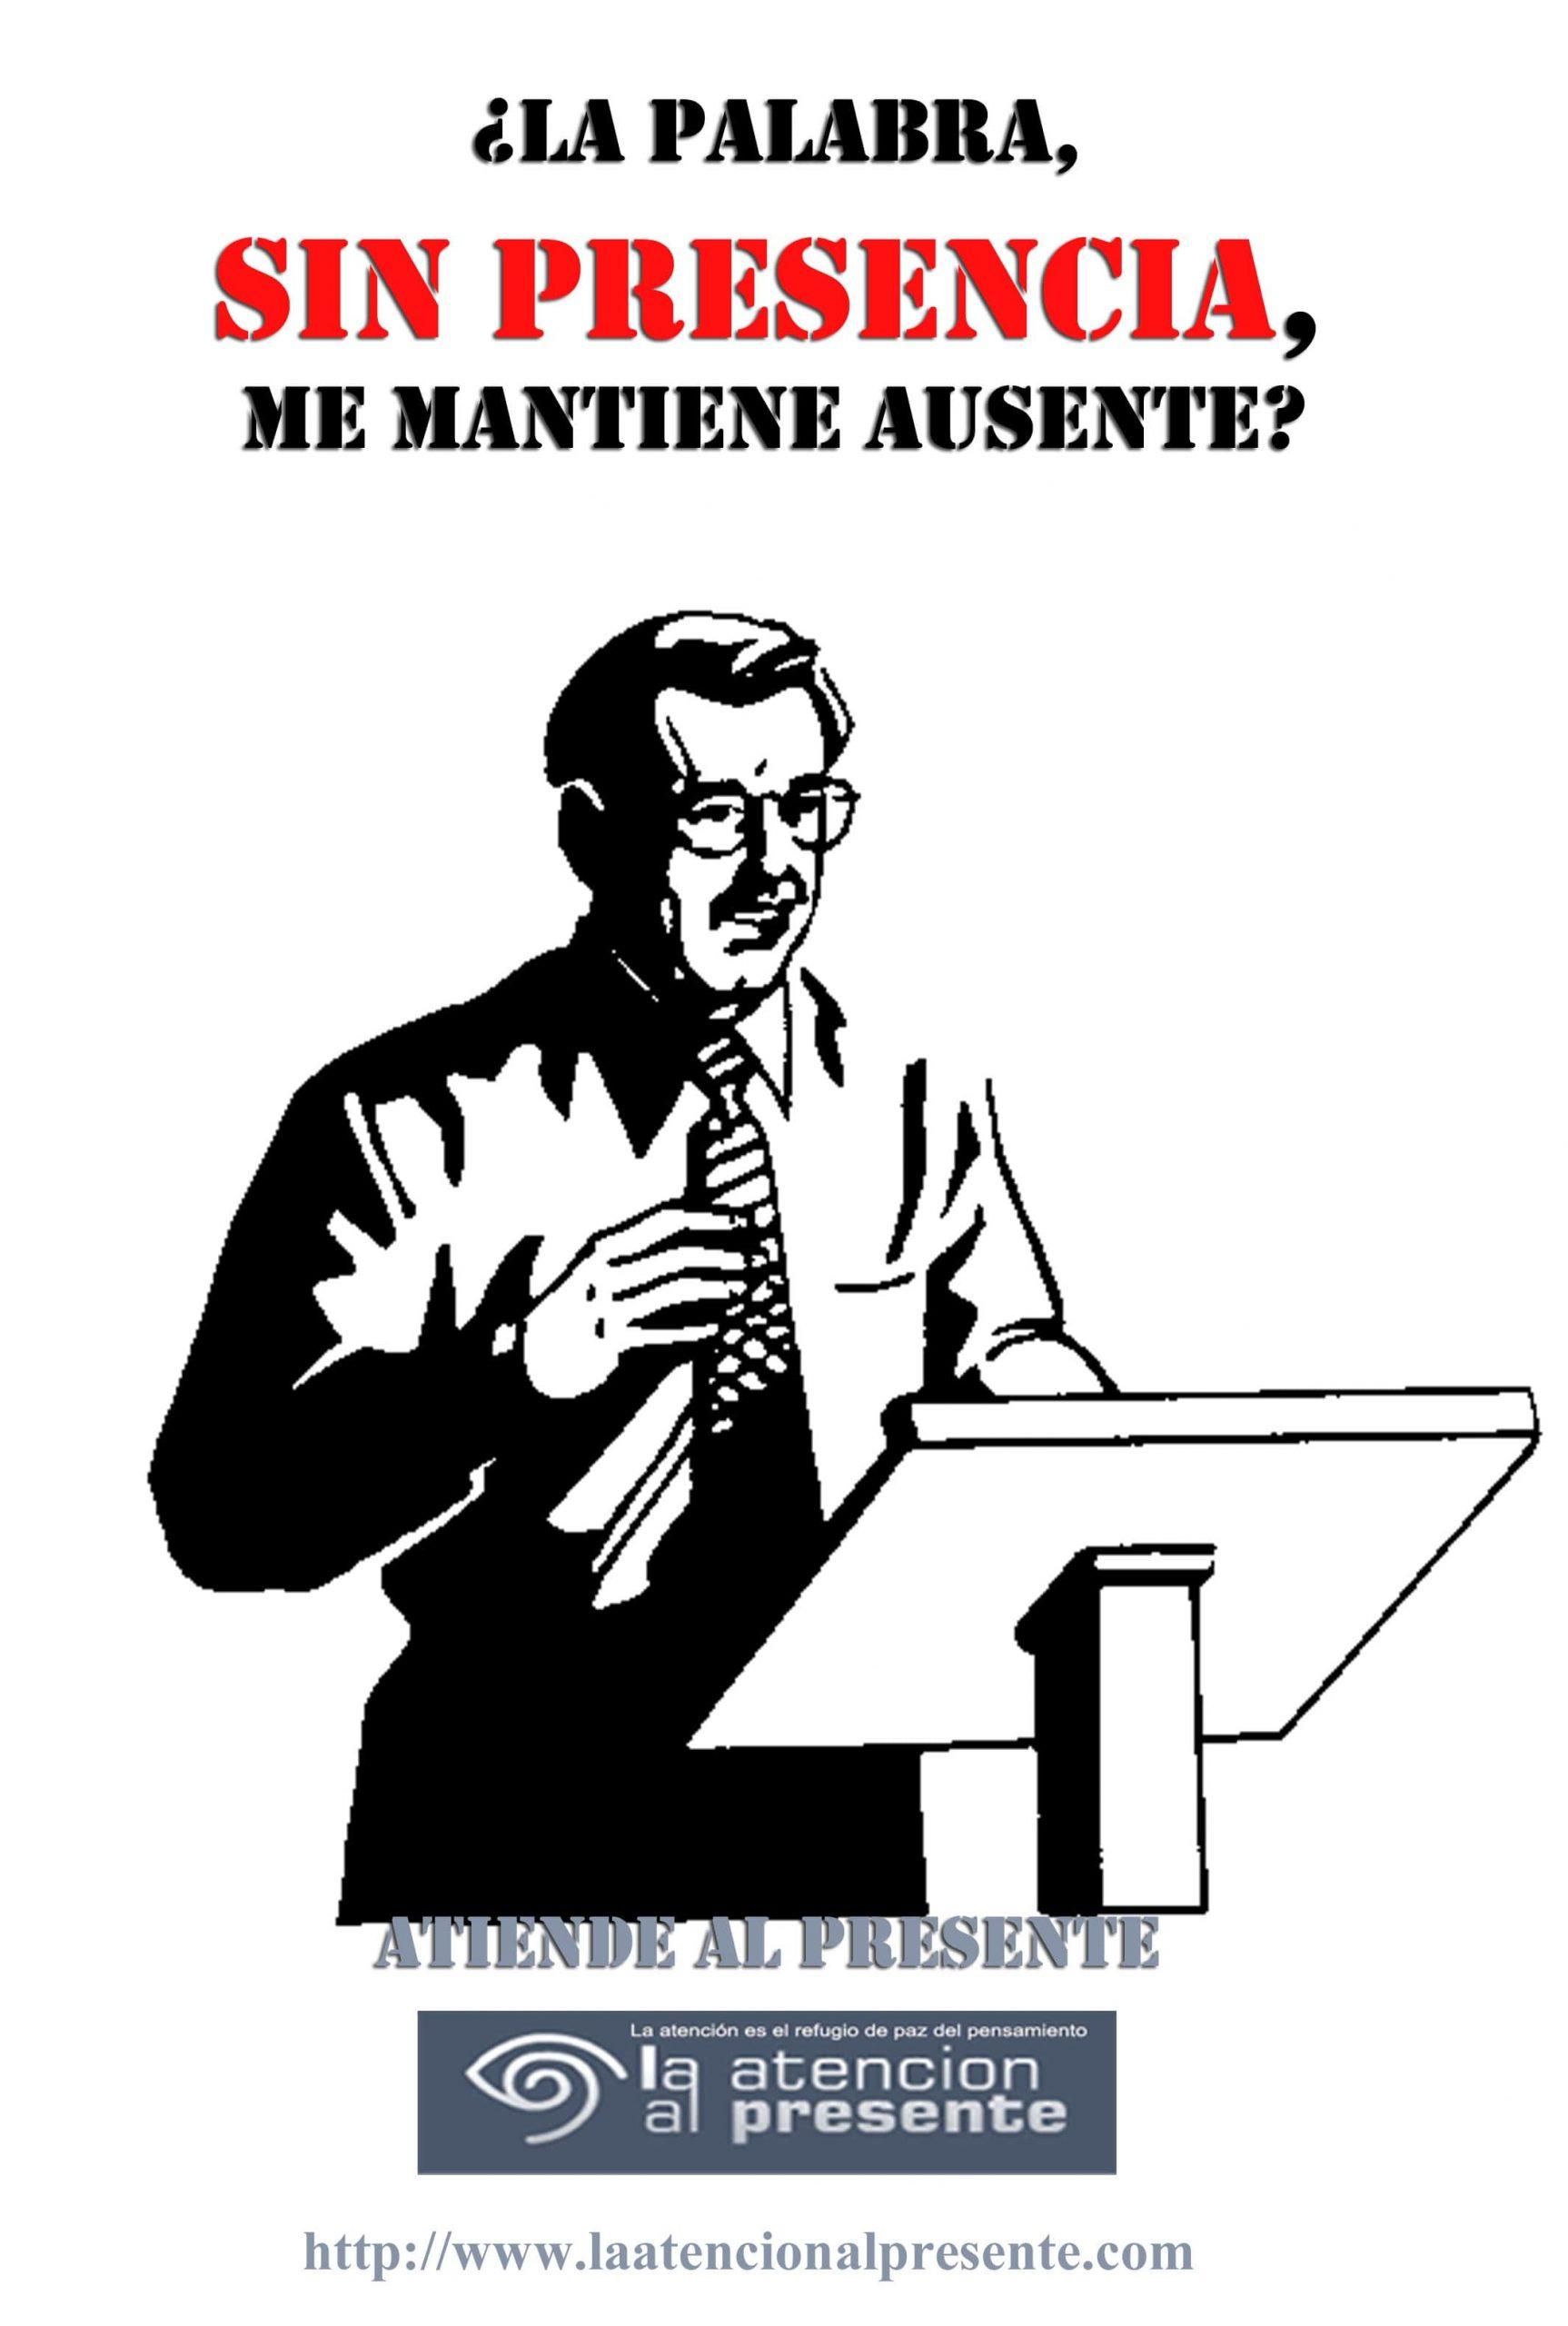 6 de diciembre Esteban La palabra sin PRESENCIA me AUSENTA min scaled